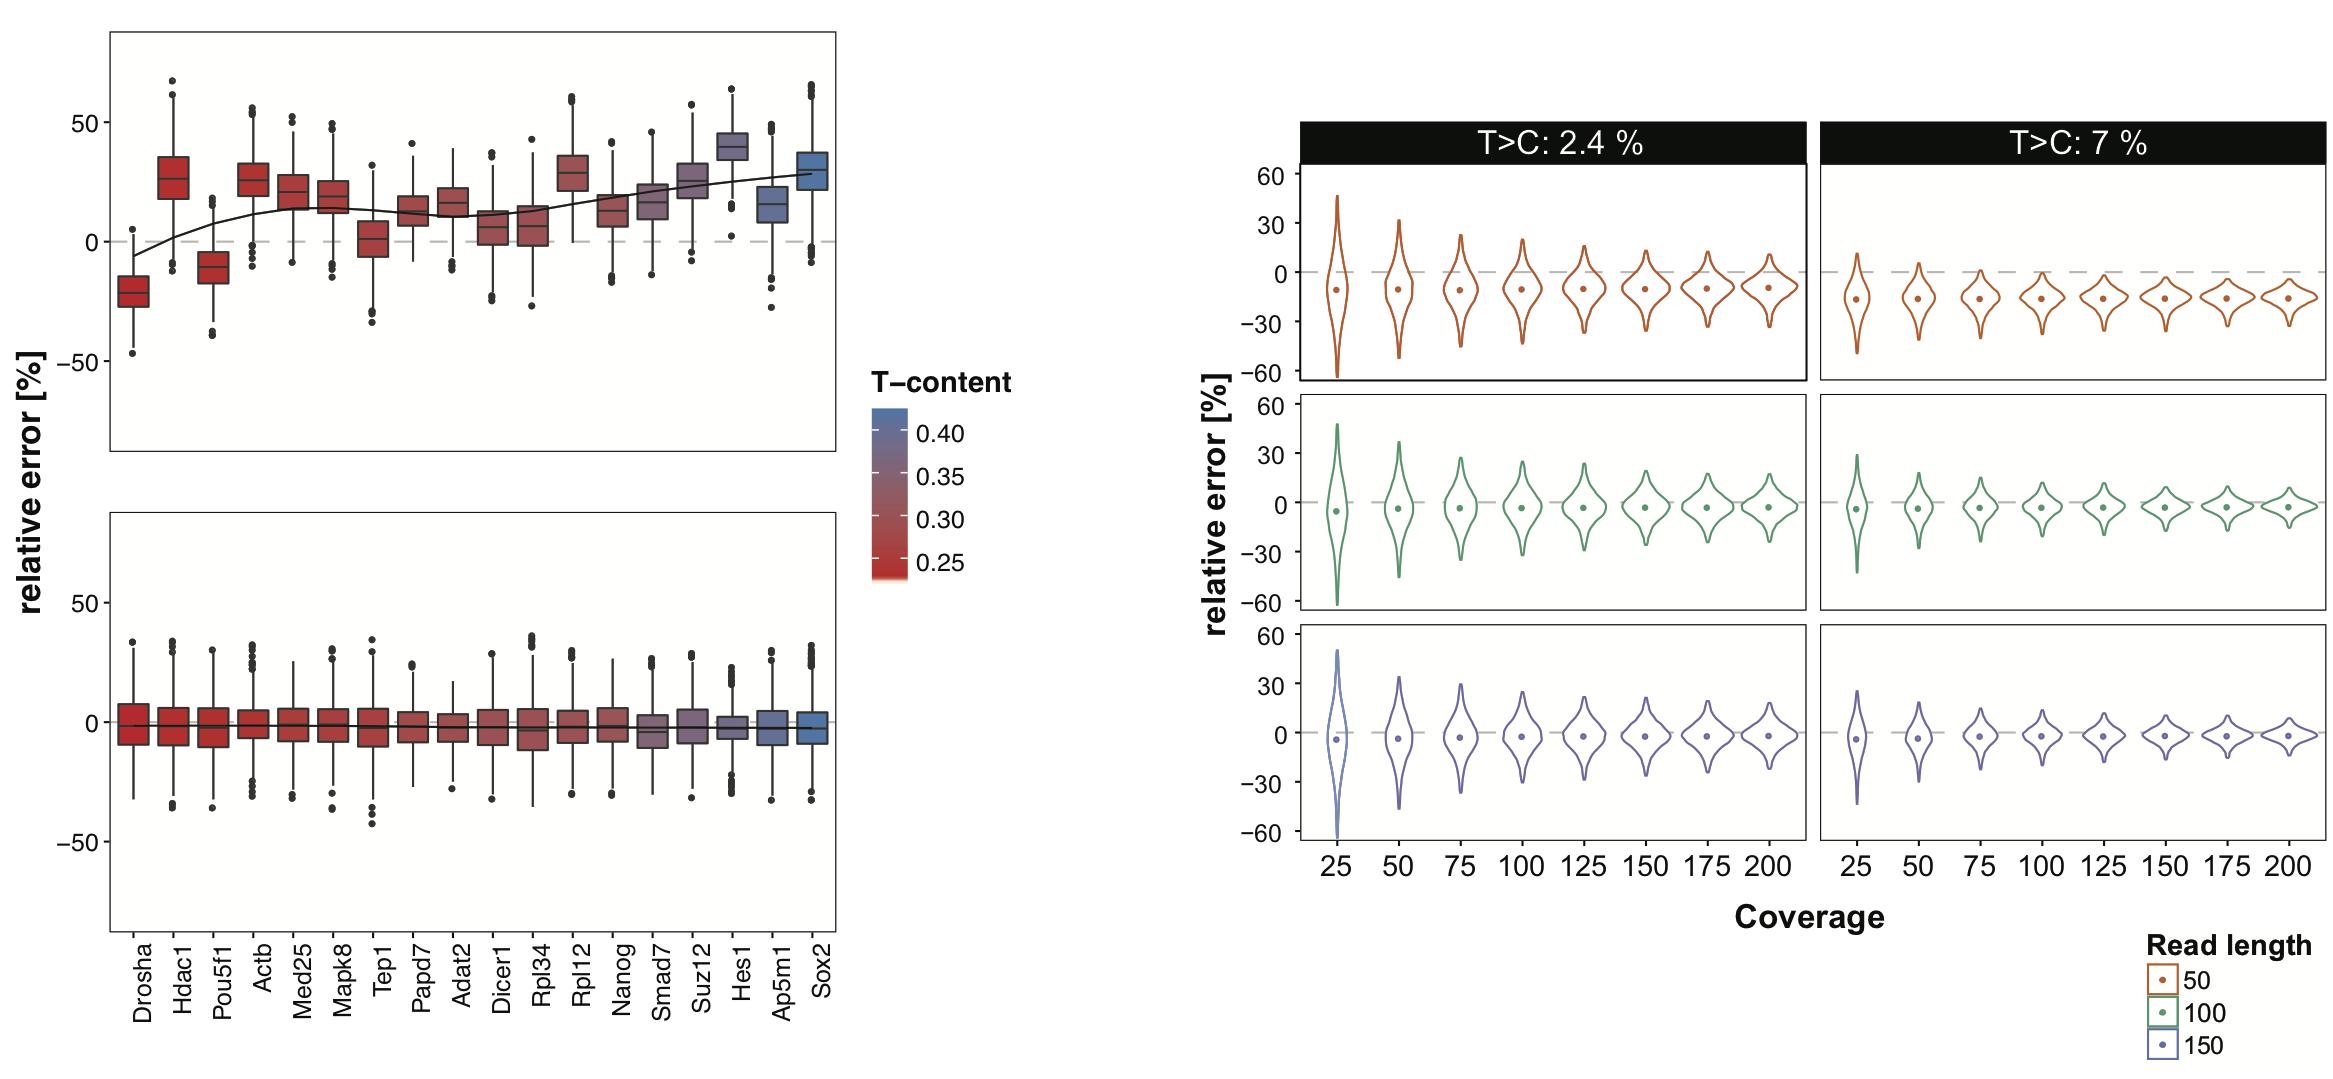 T-content coverage aware quantification